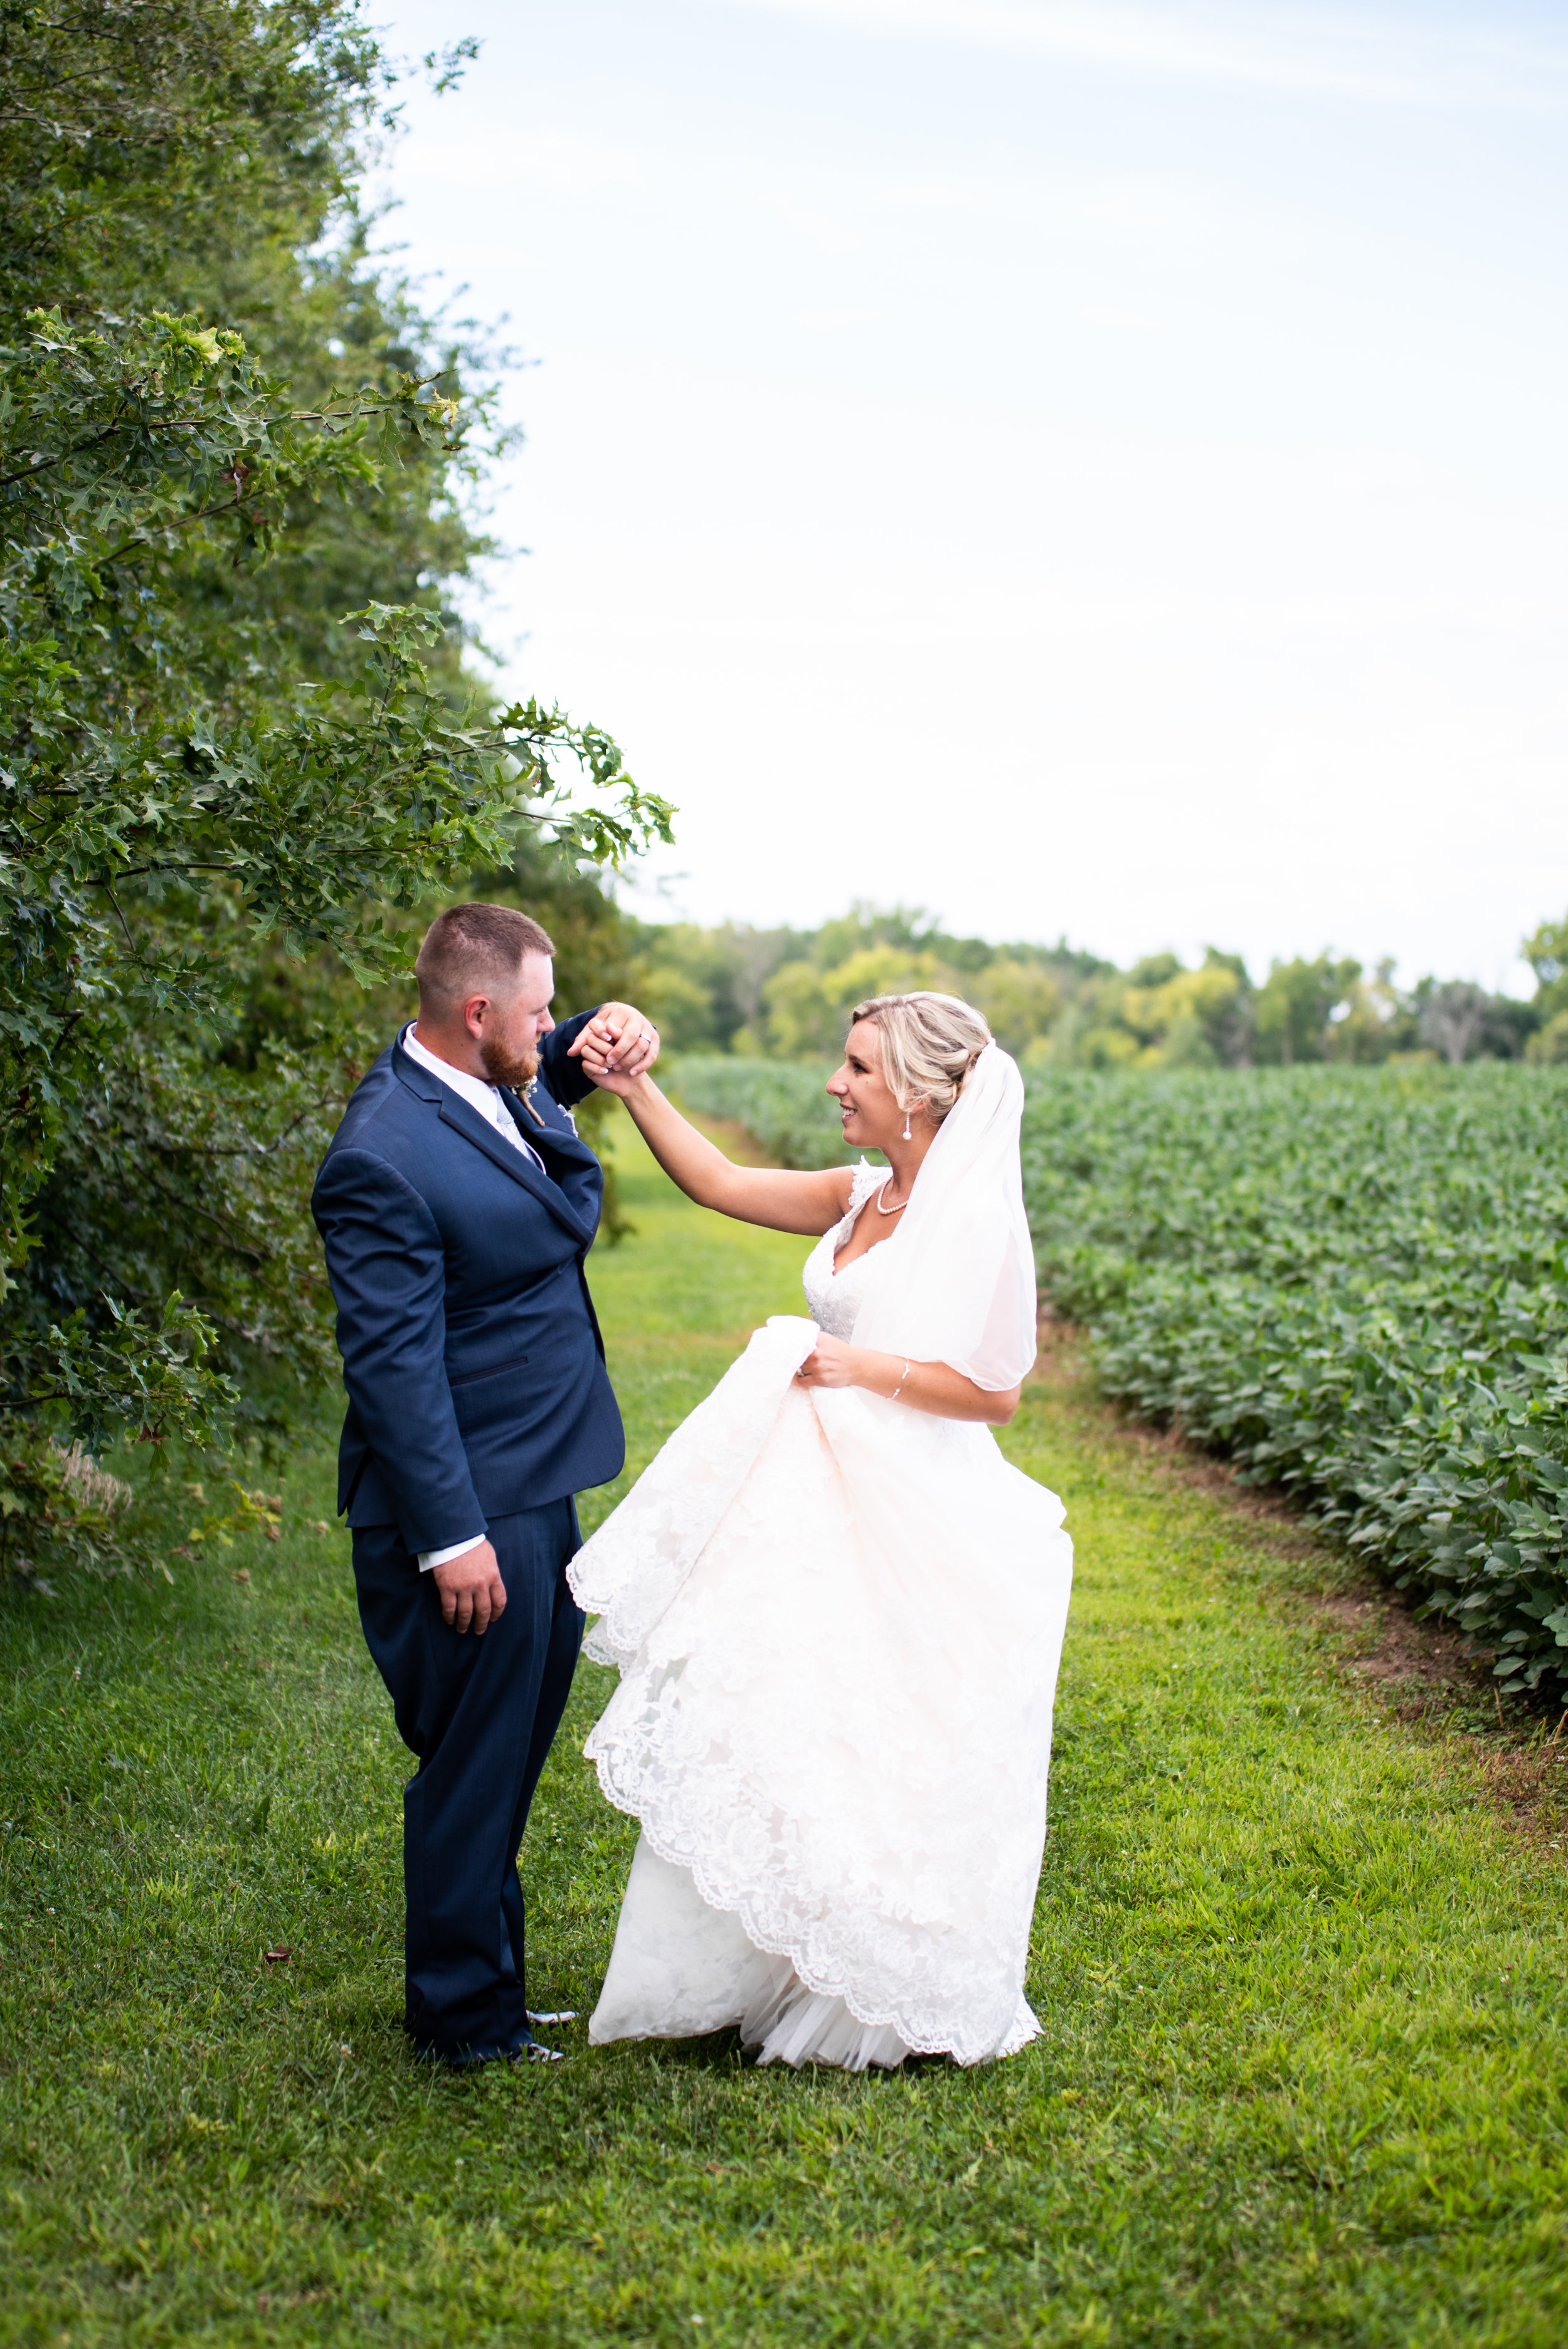 wedding (1 of 1)-158.jpg